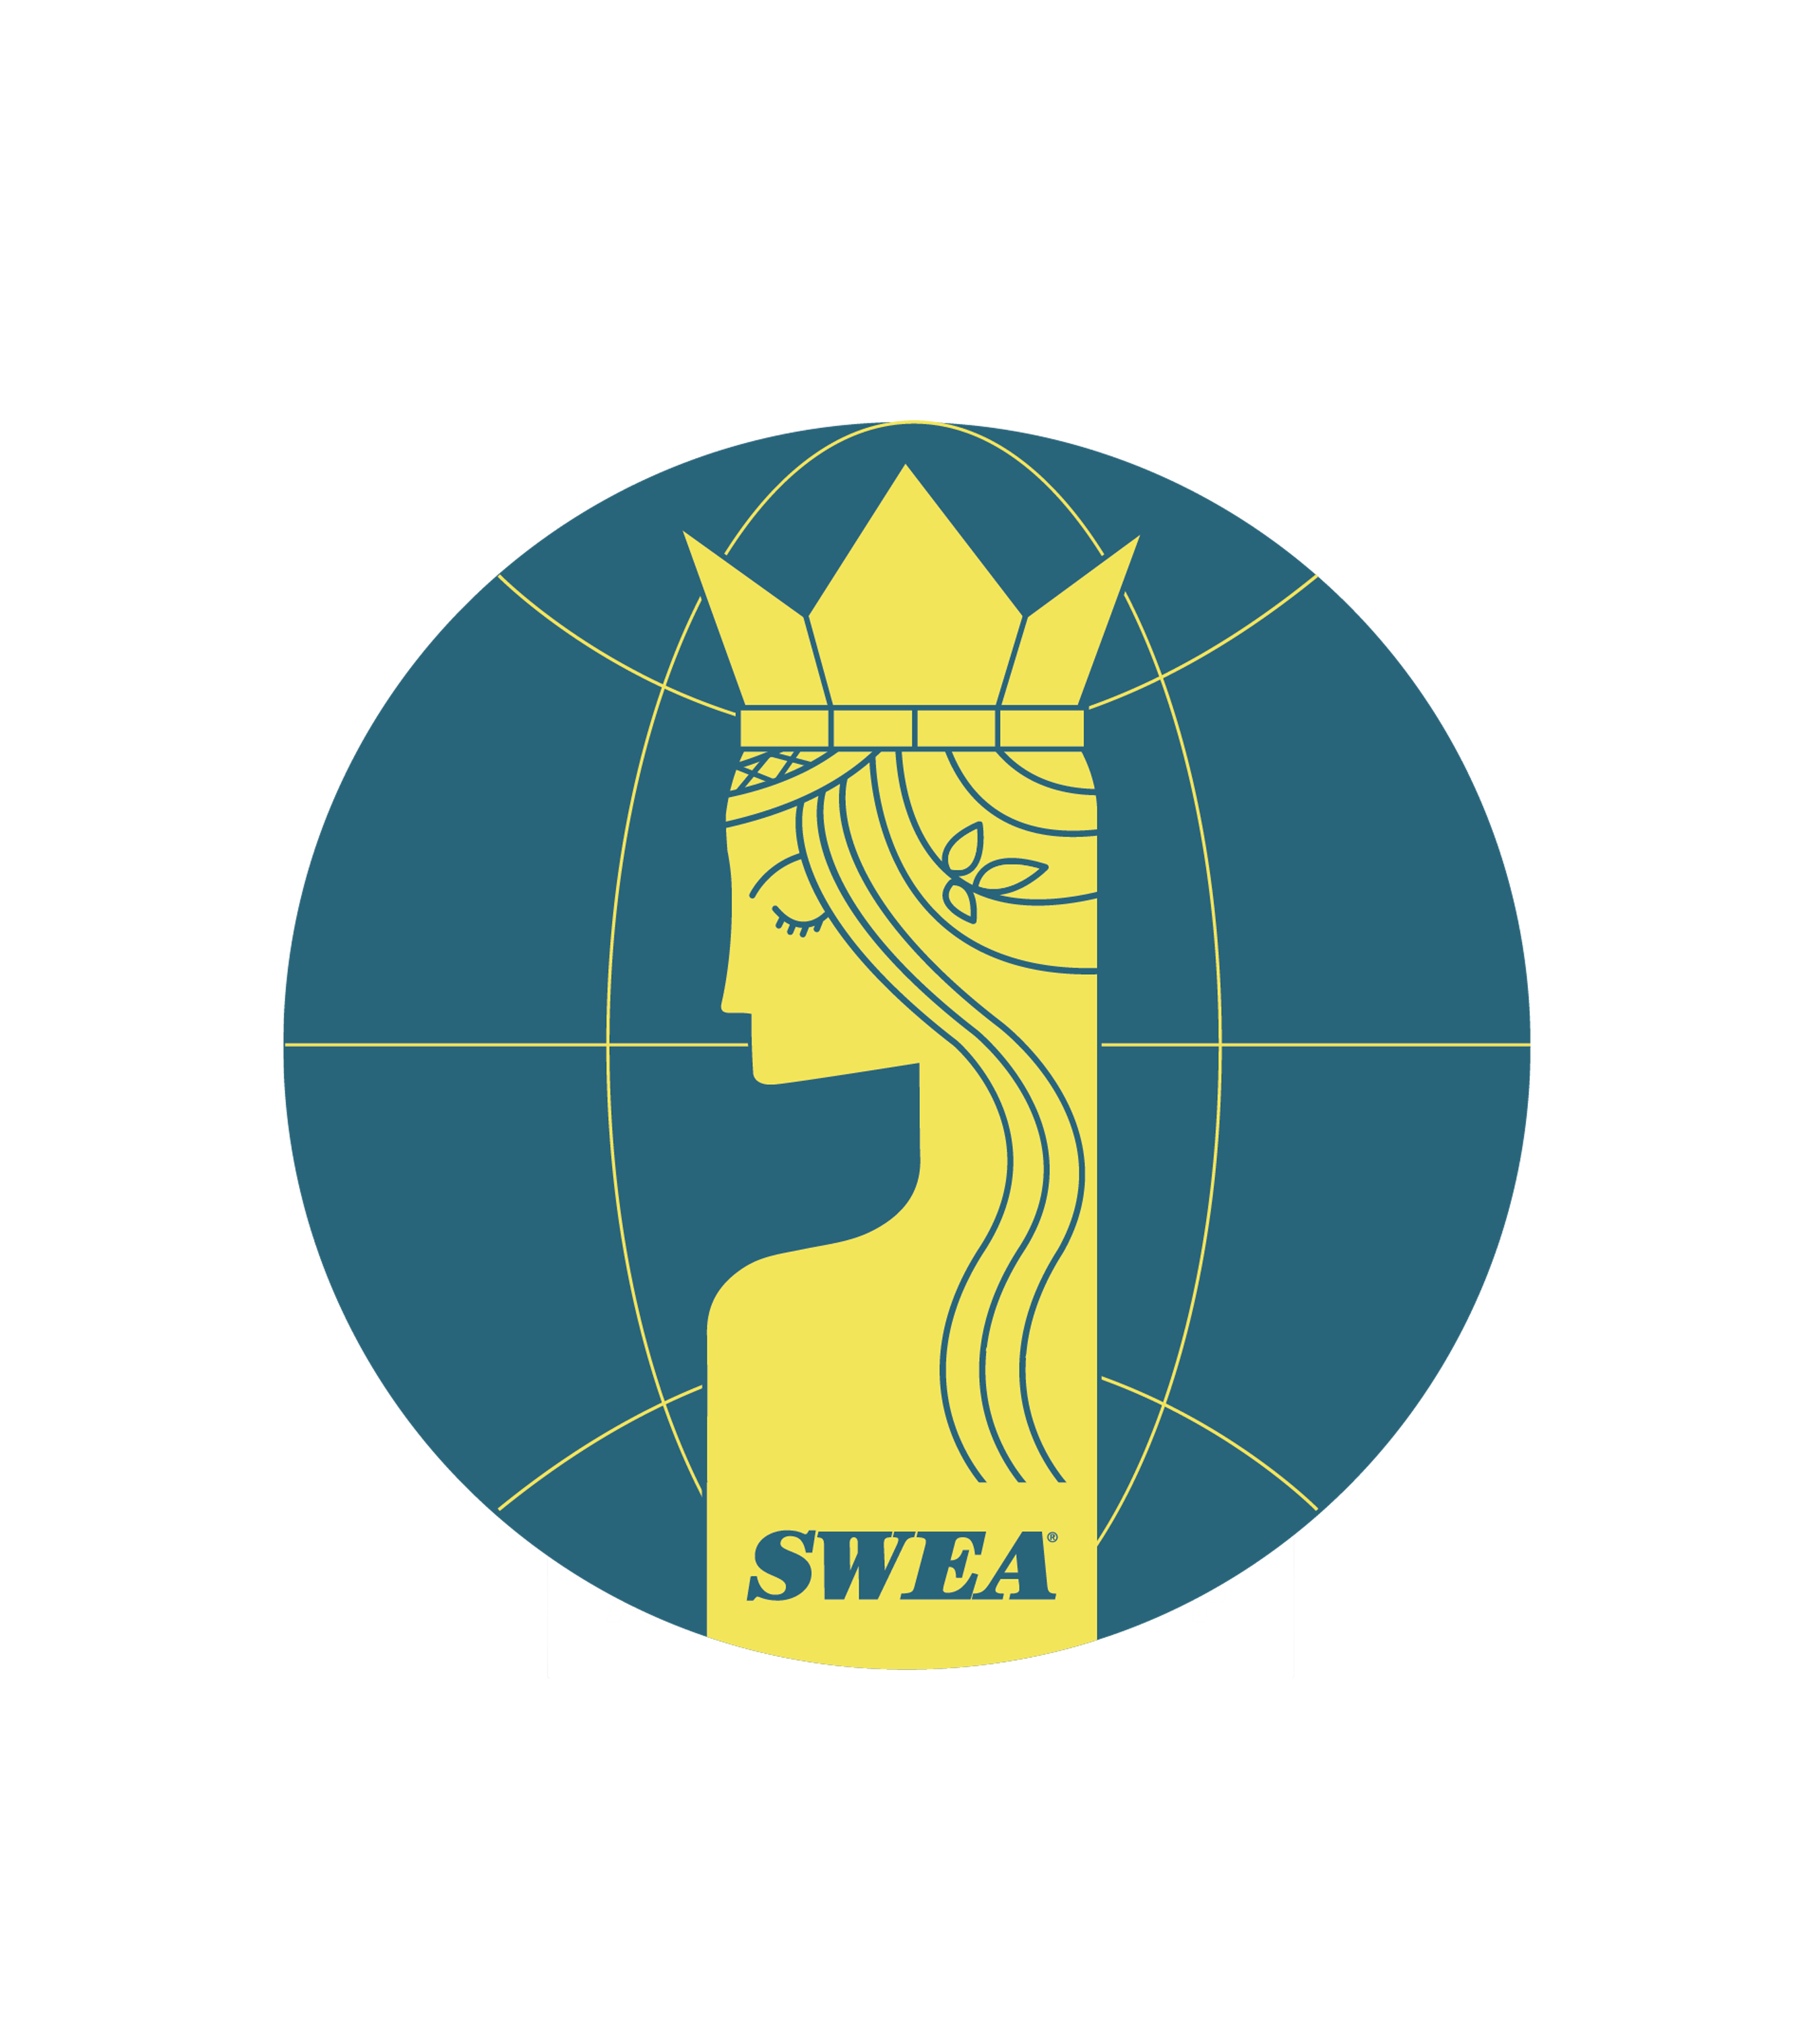 SWEA - logo